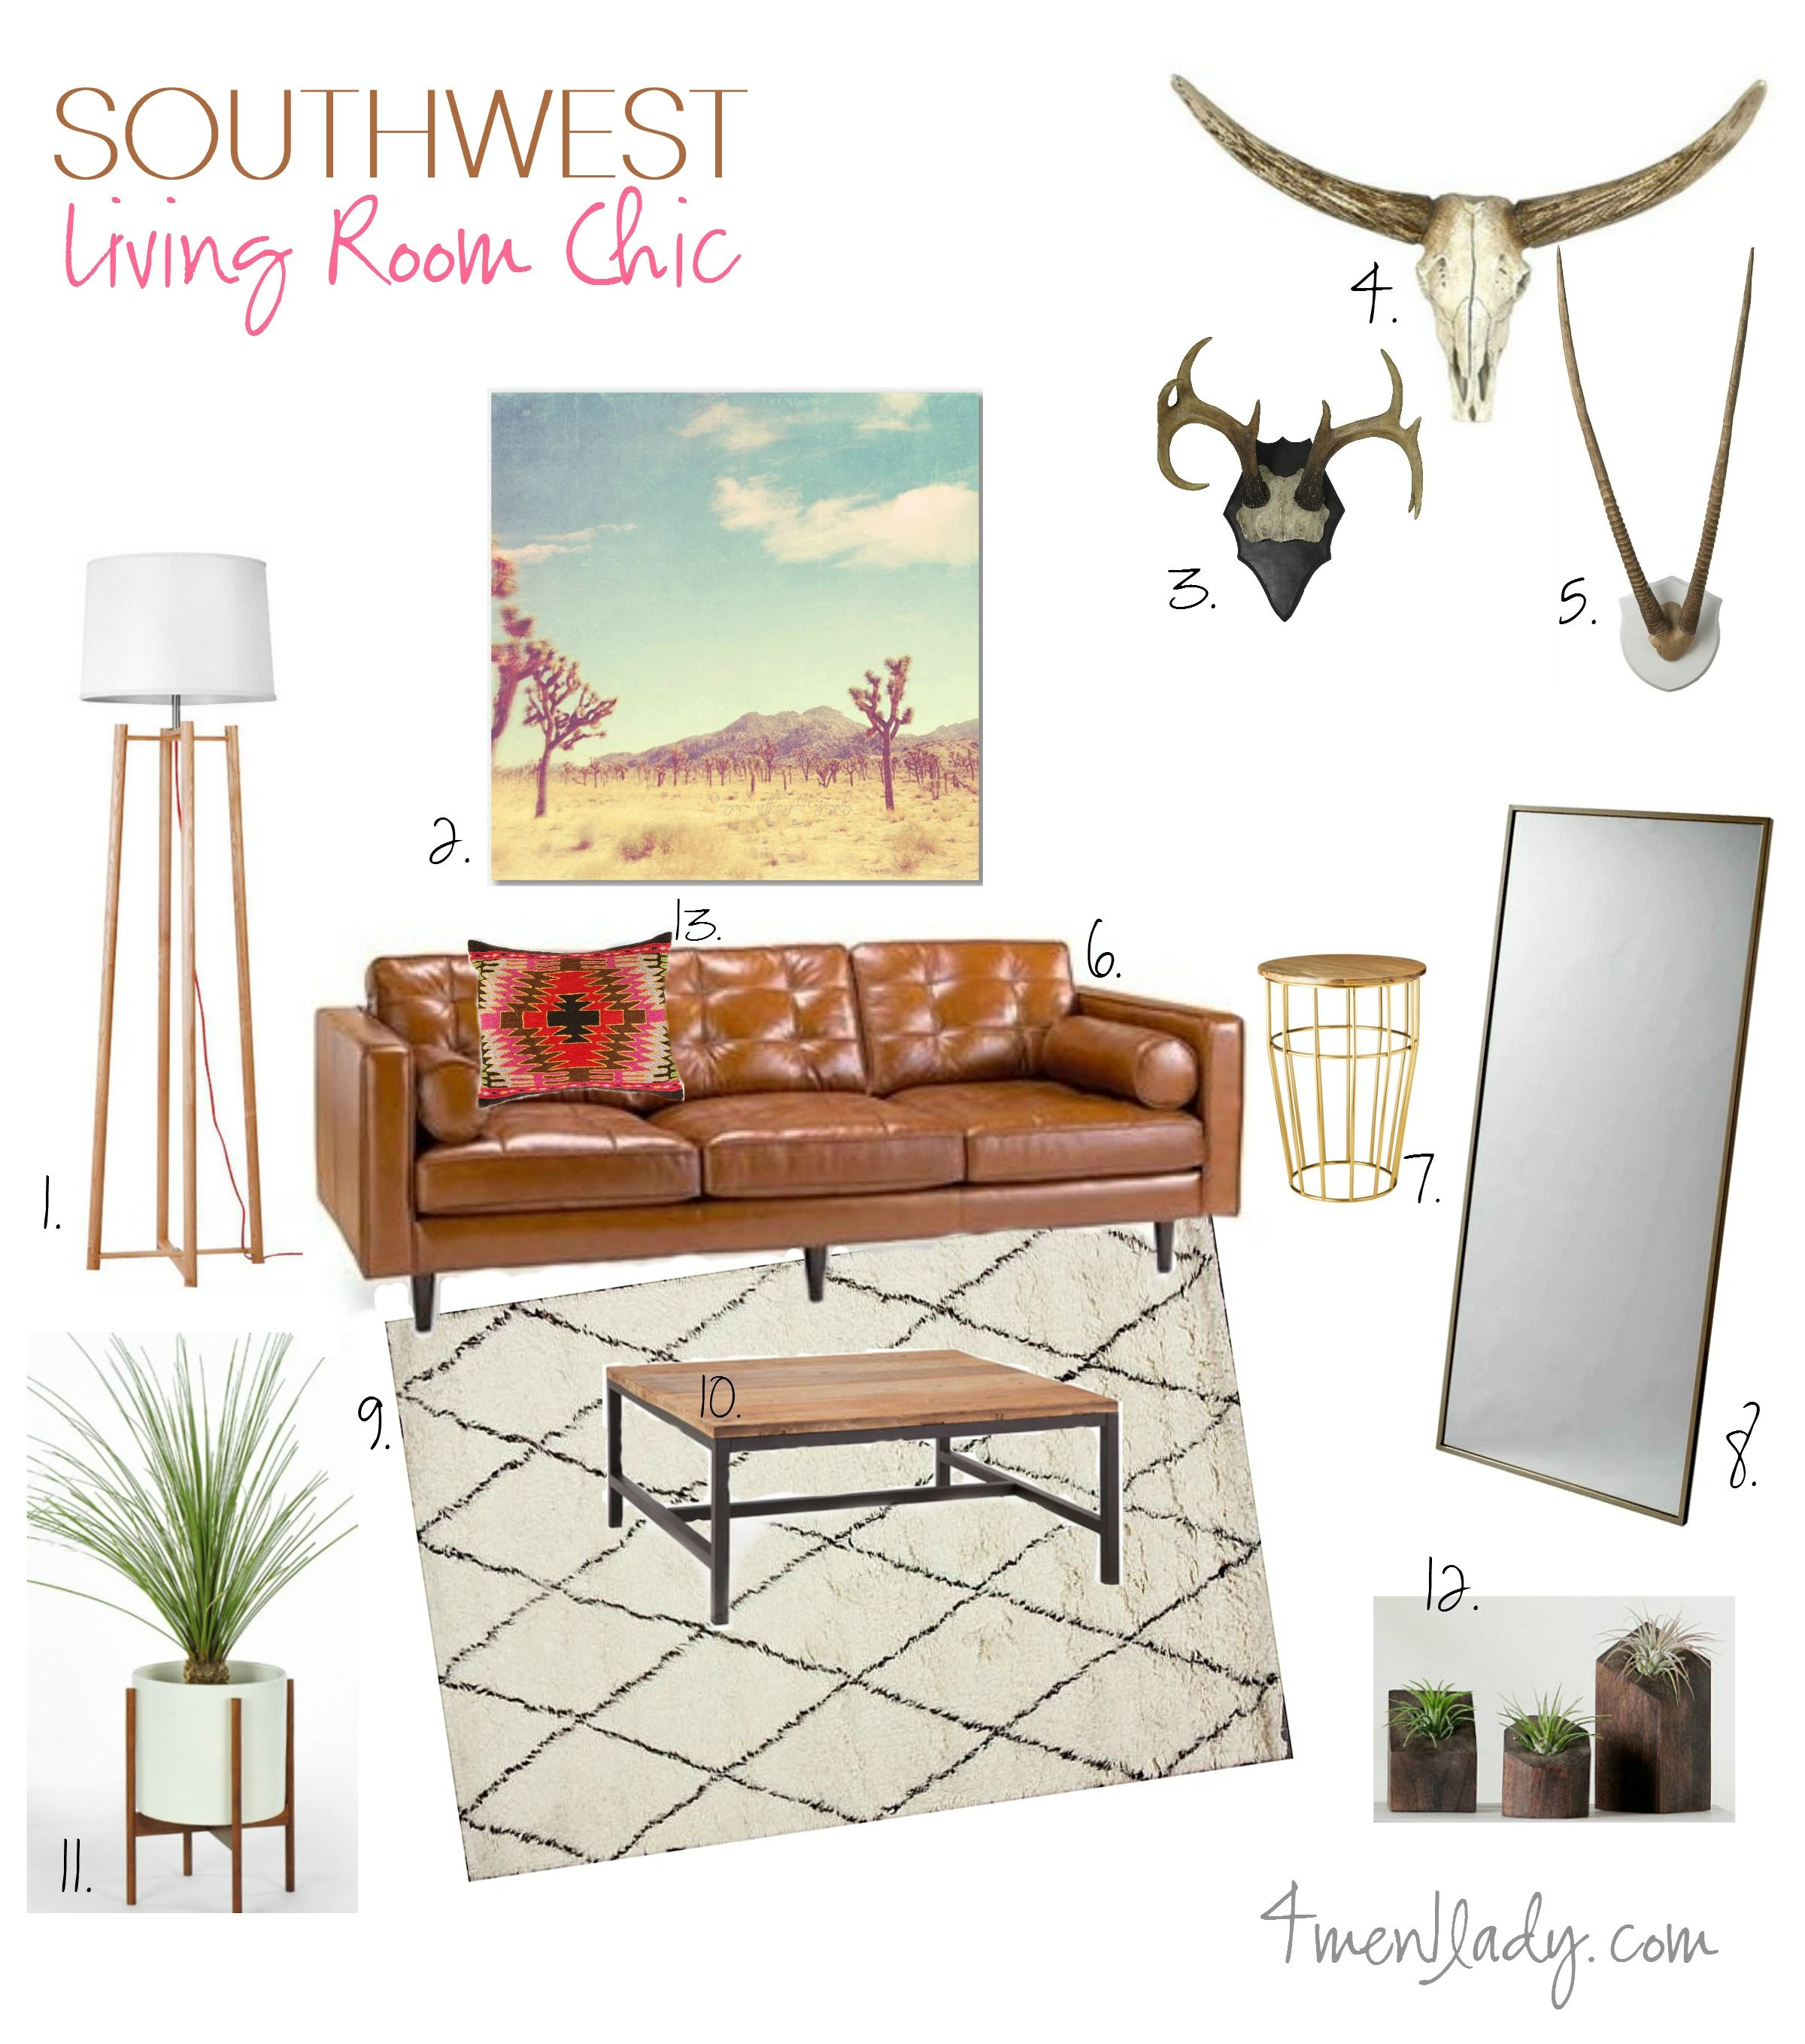 Southwest Living Room Dreams 4 Men 1 Lady Southwest Living Southwest Decor Living Room Modern Southwest Decor #southwestern #style #living #room #furniture